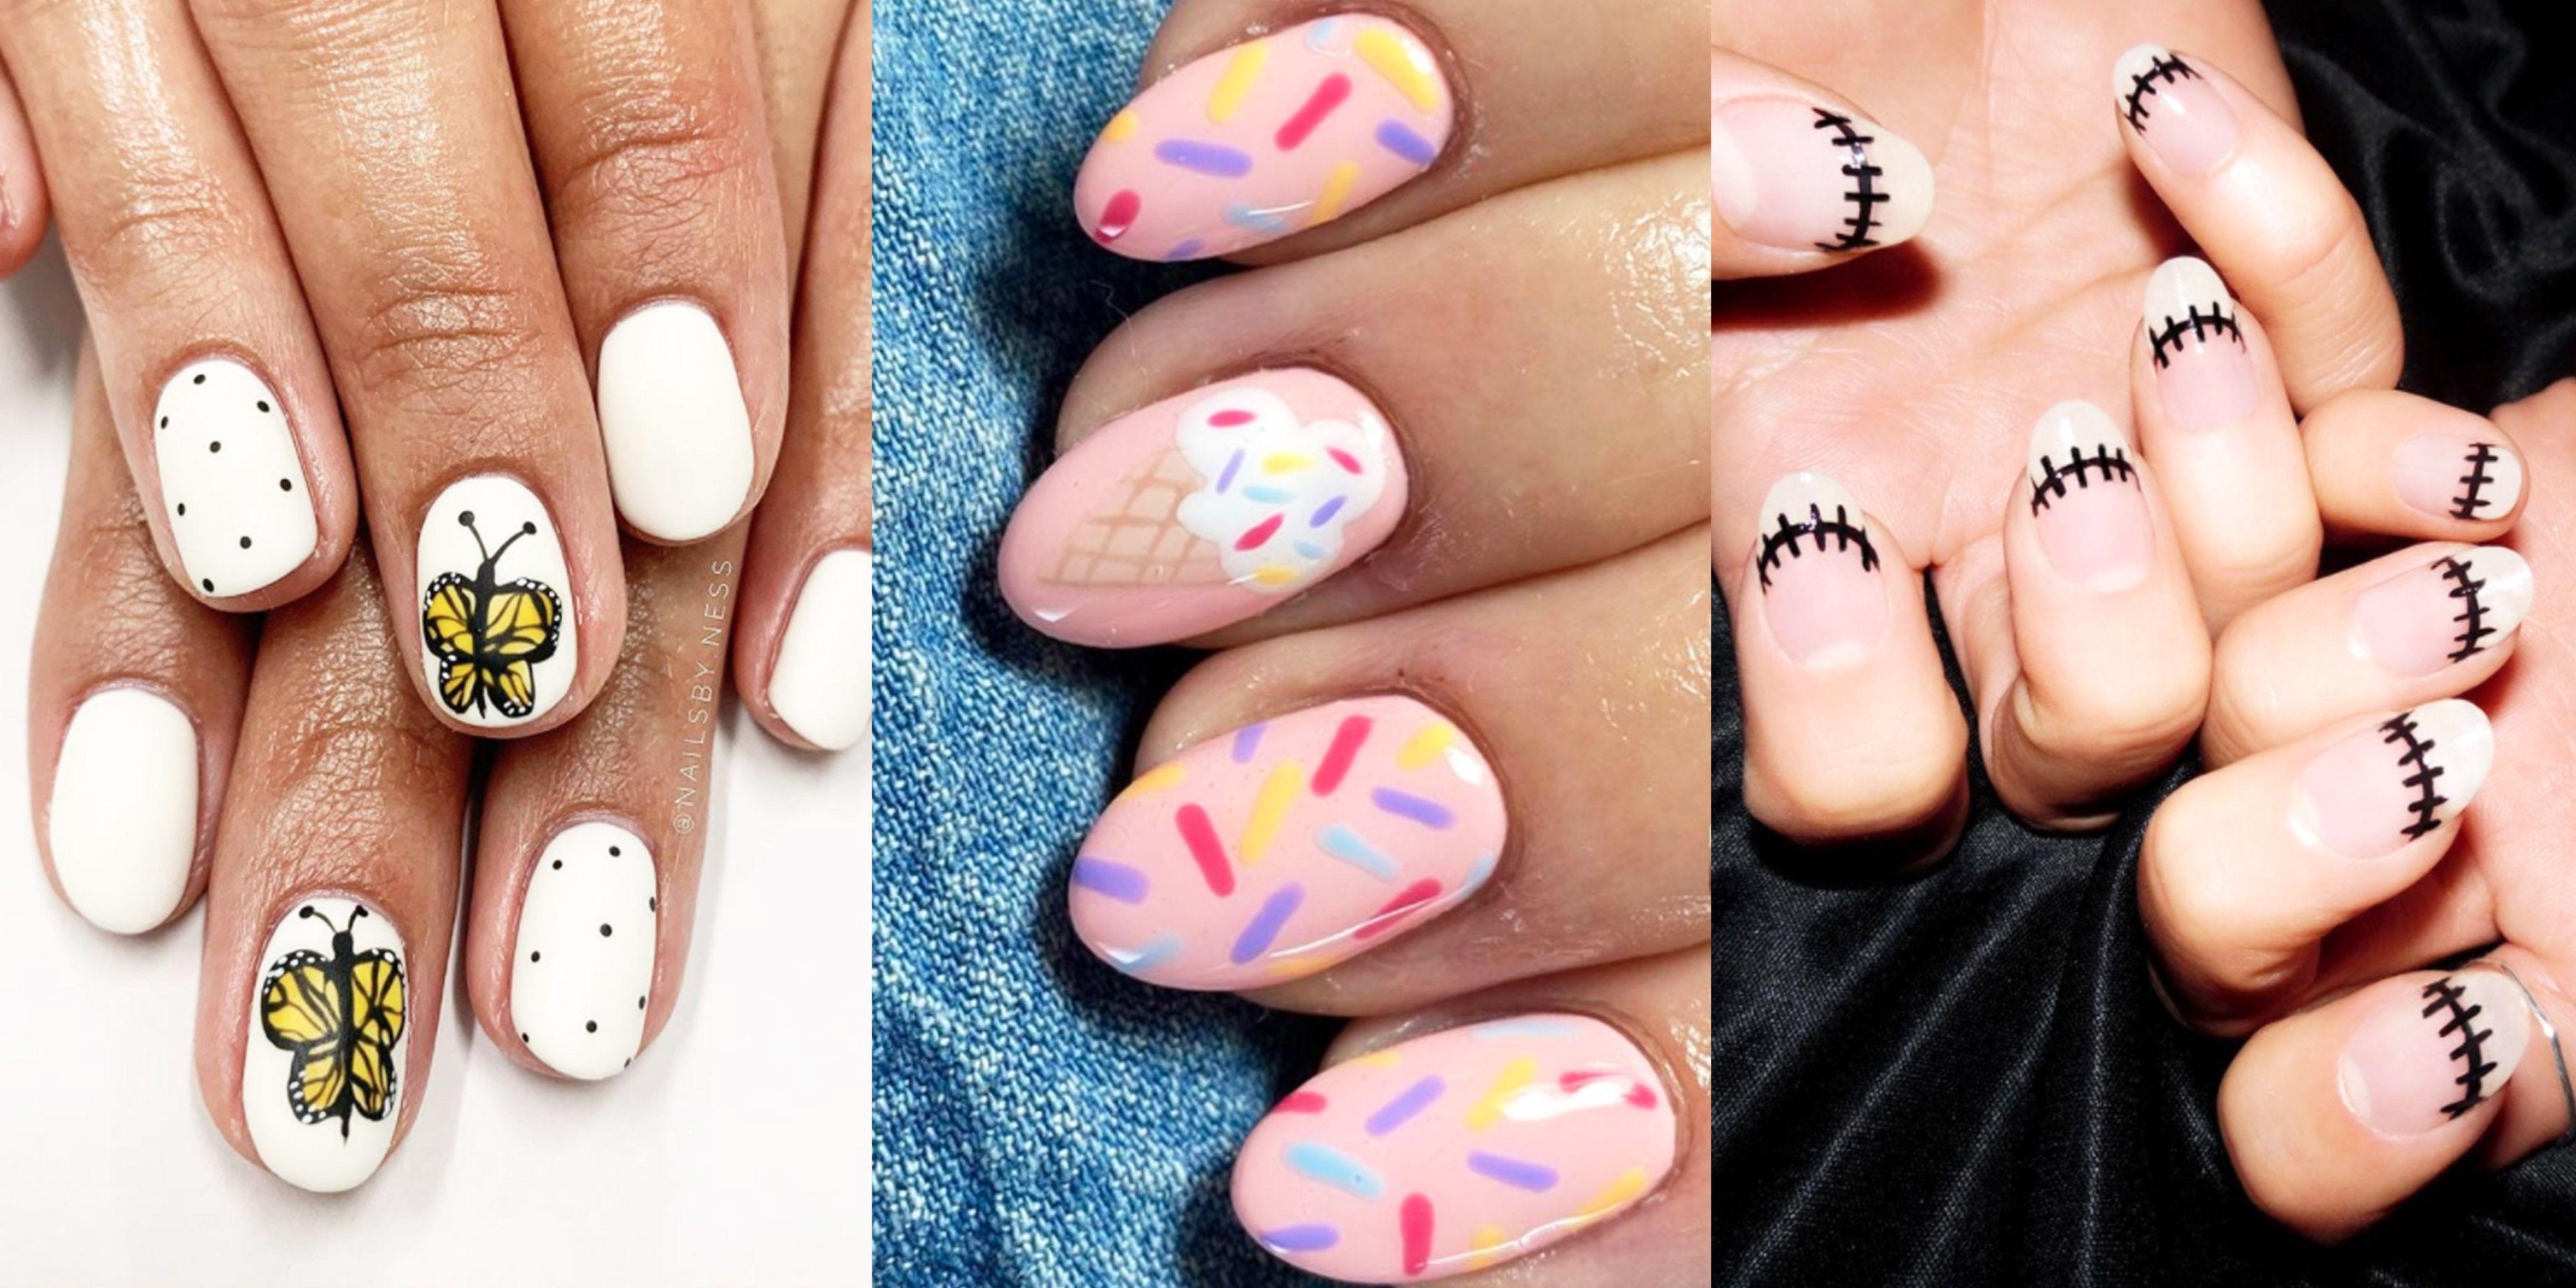 58 Halloween Nail Art Ideas 2020 How To Do Halloween Nails